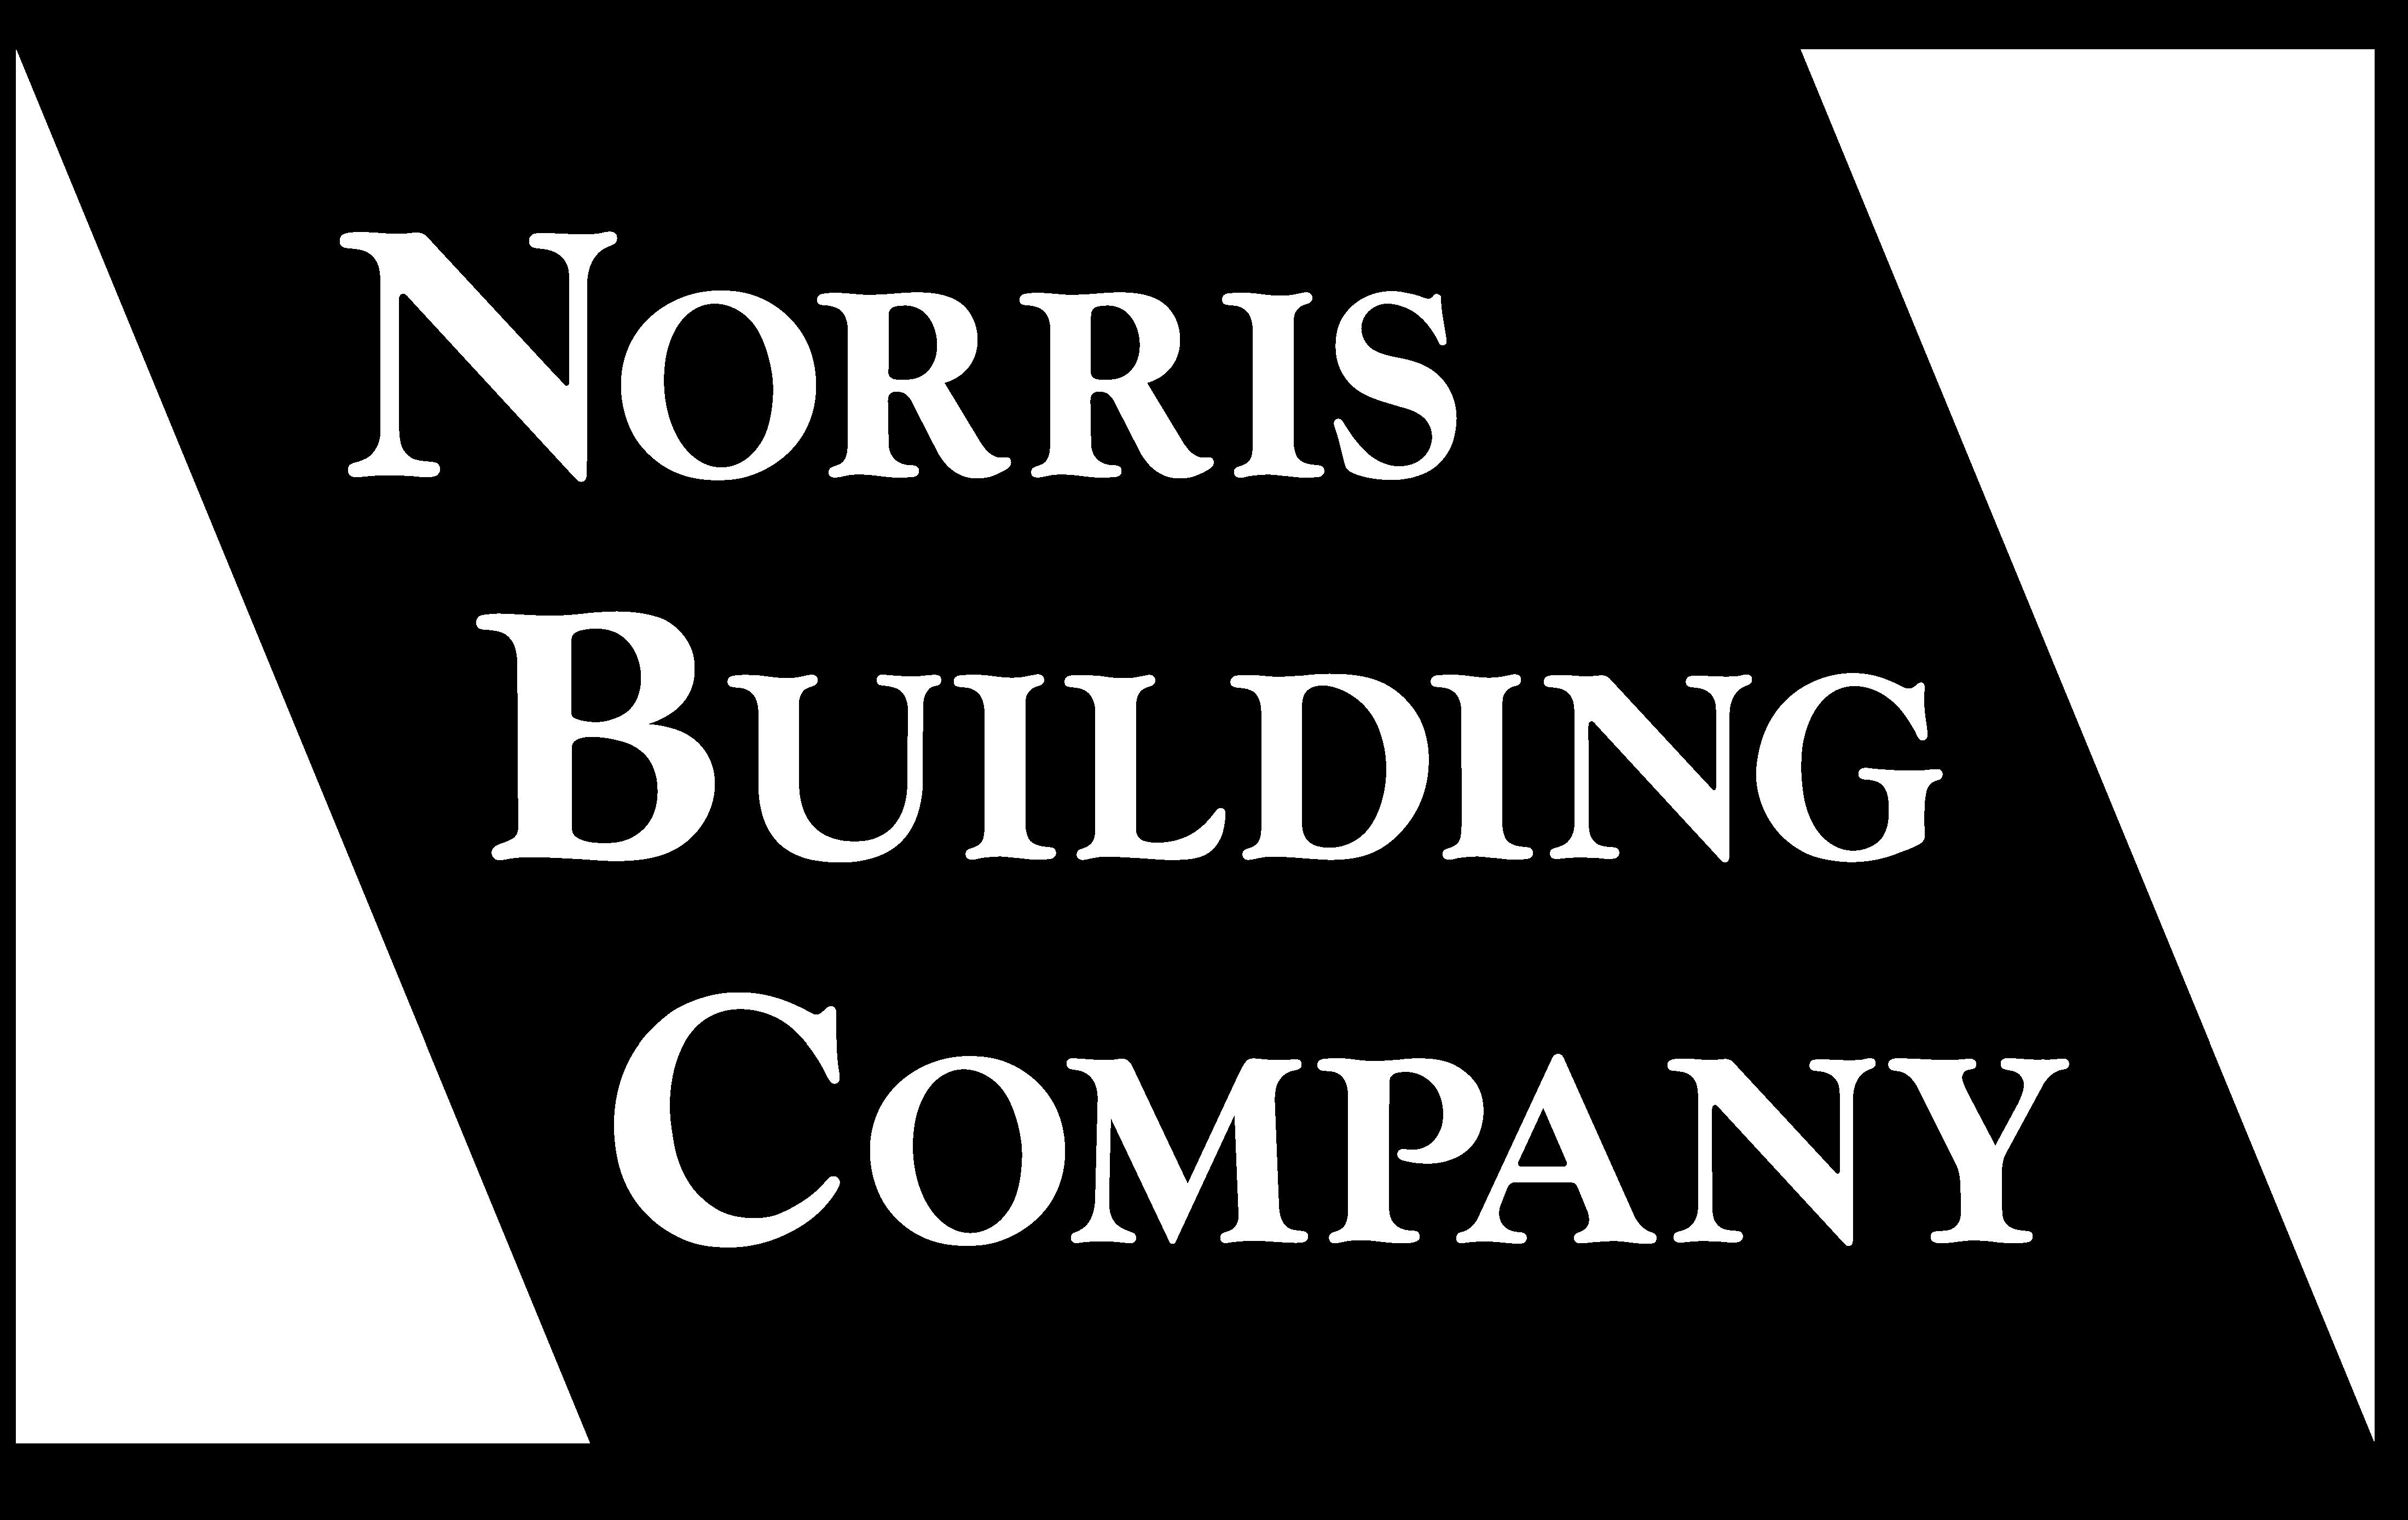 Norris Building Company